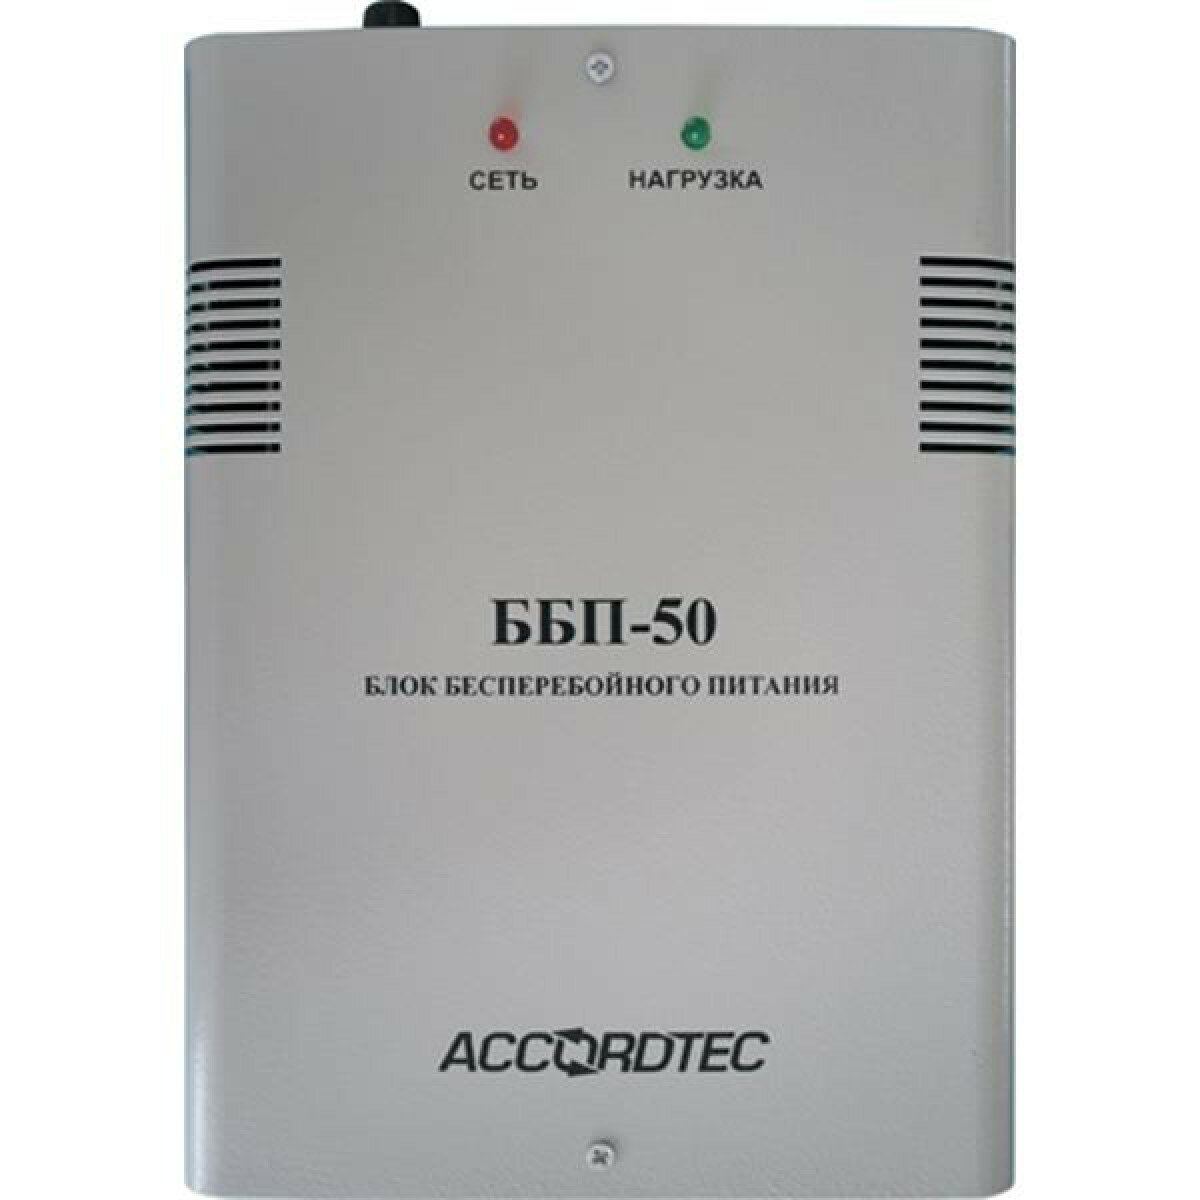 AccordTec ББП-50 исп. 1